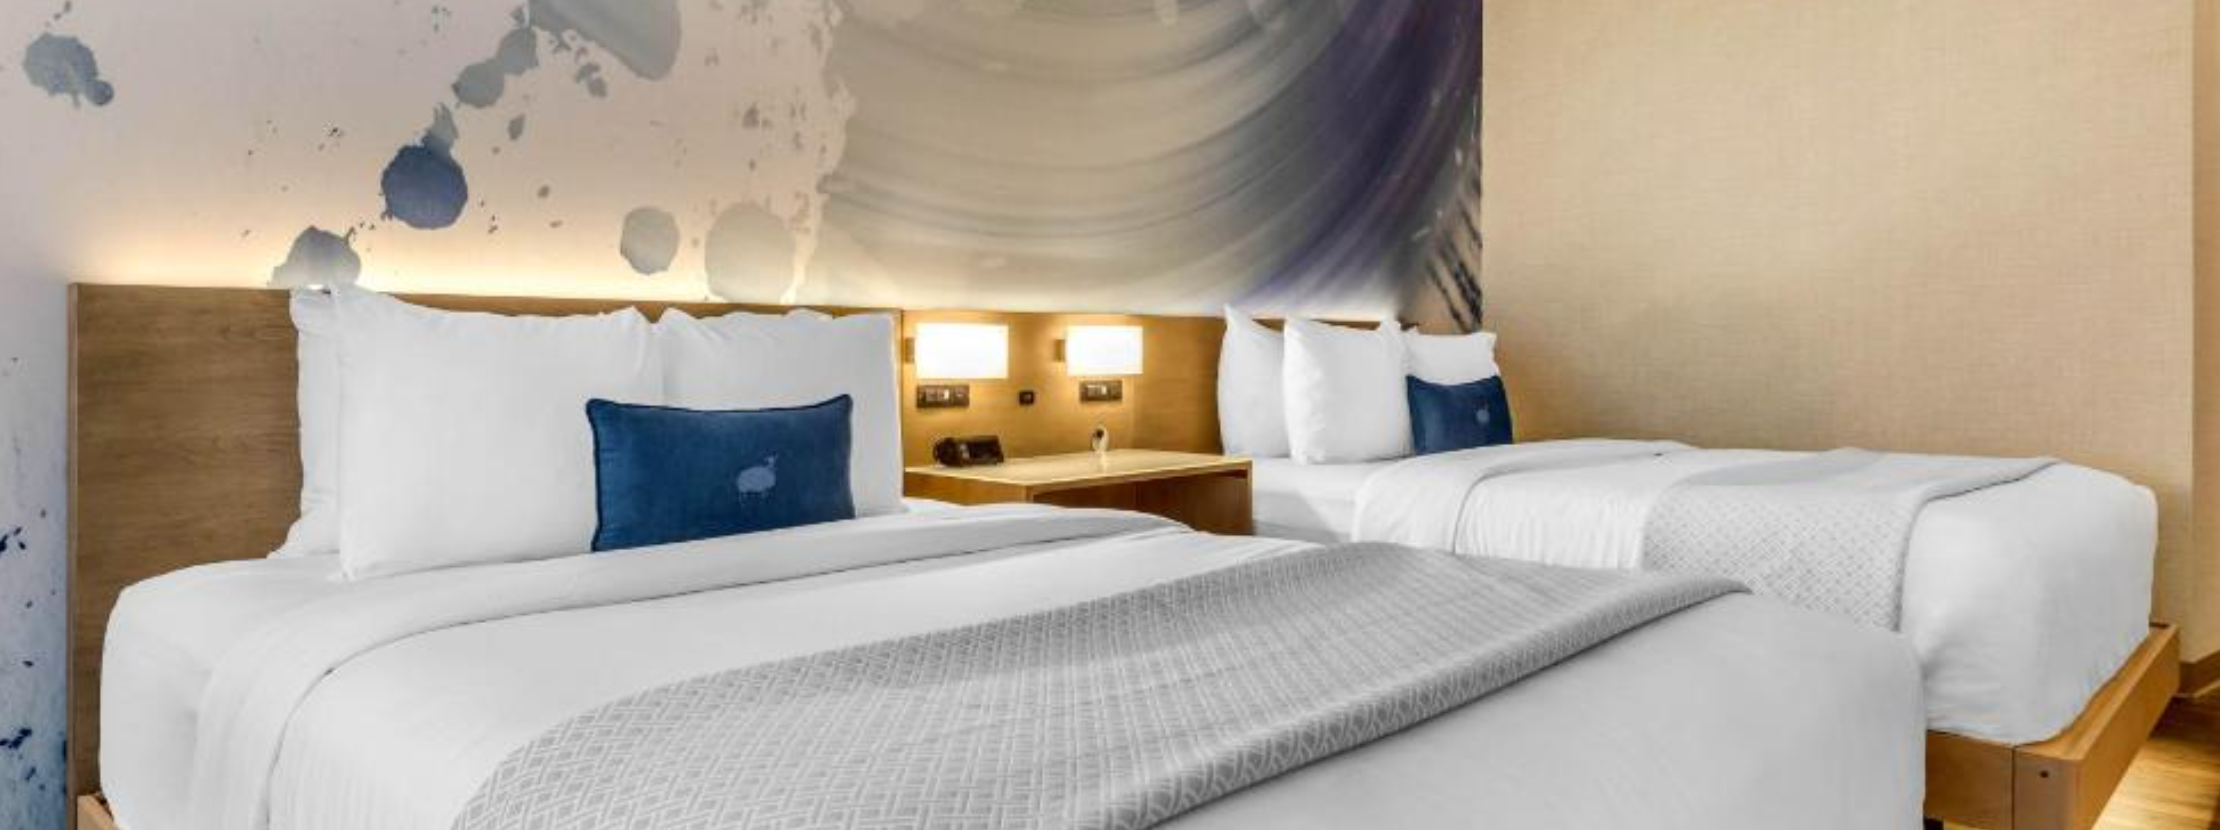 https://www.hotelsbyday.com/_data/default-hotel_image/3/18827/screenshot-2020-06-15-at-12-44-52-pm.png